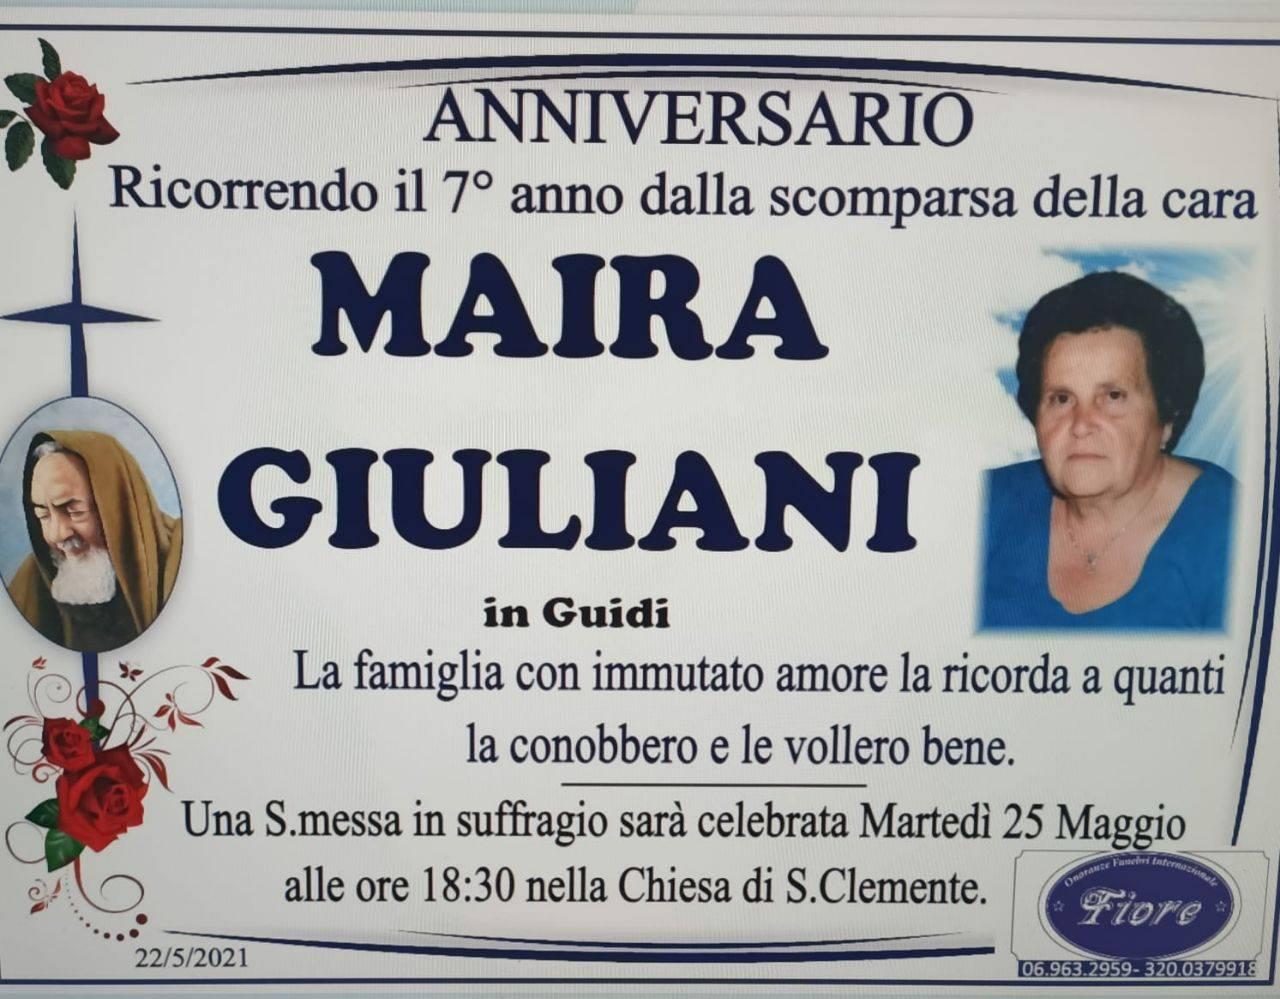 Maira Giuliani